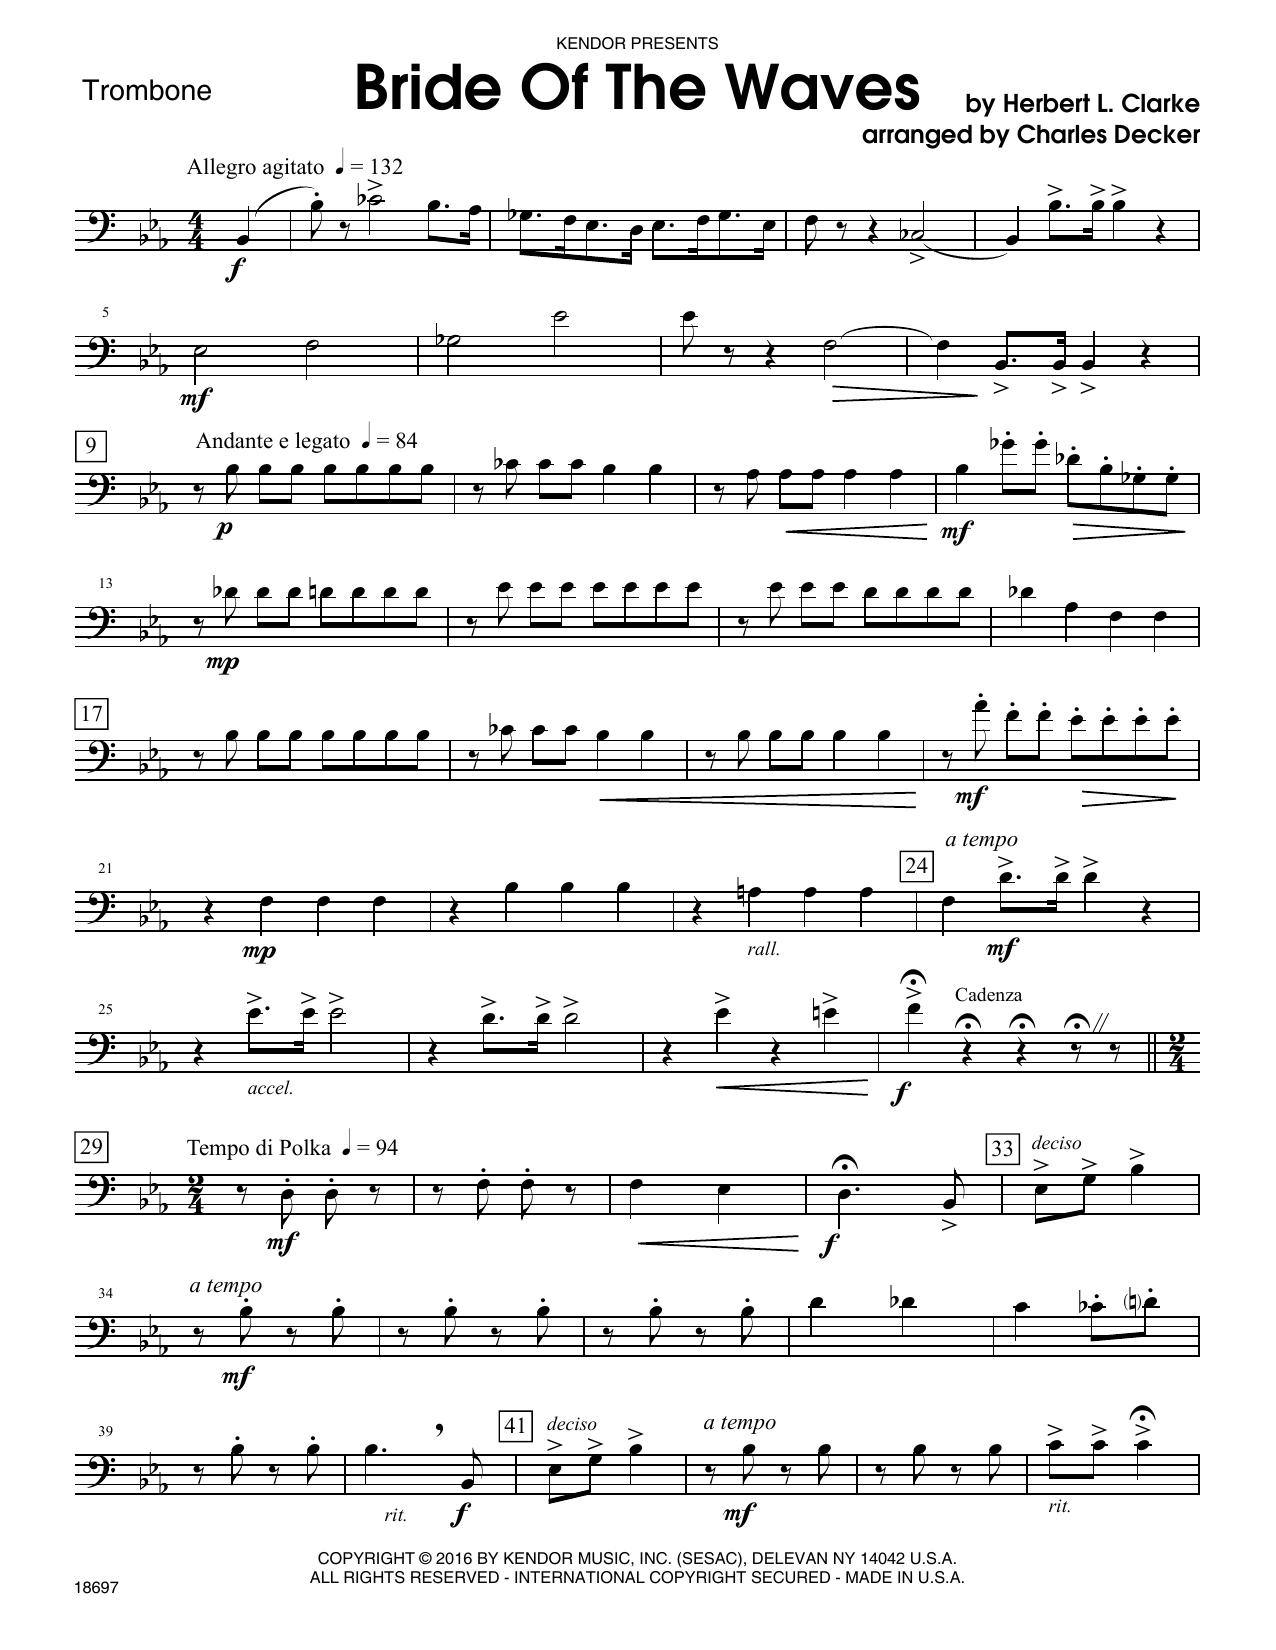 Bride Of The Waves - Trombone Sheet Music